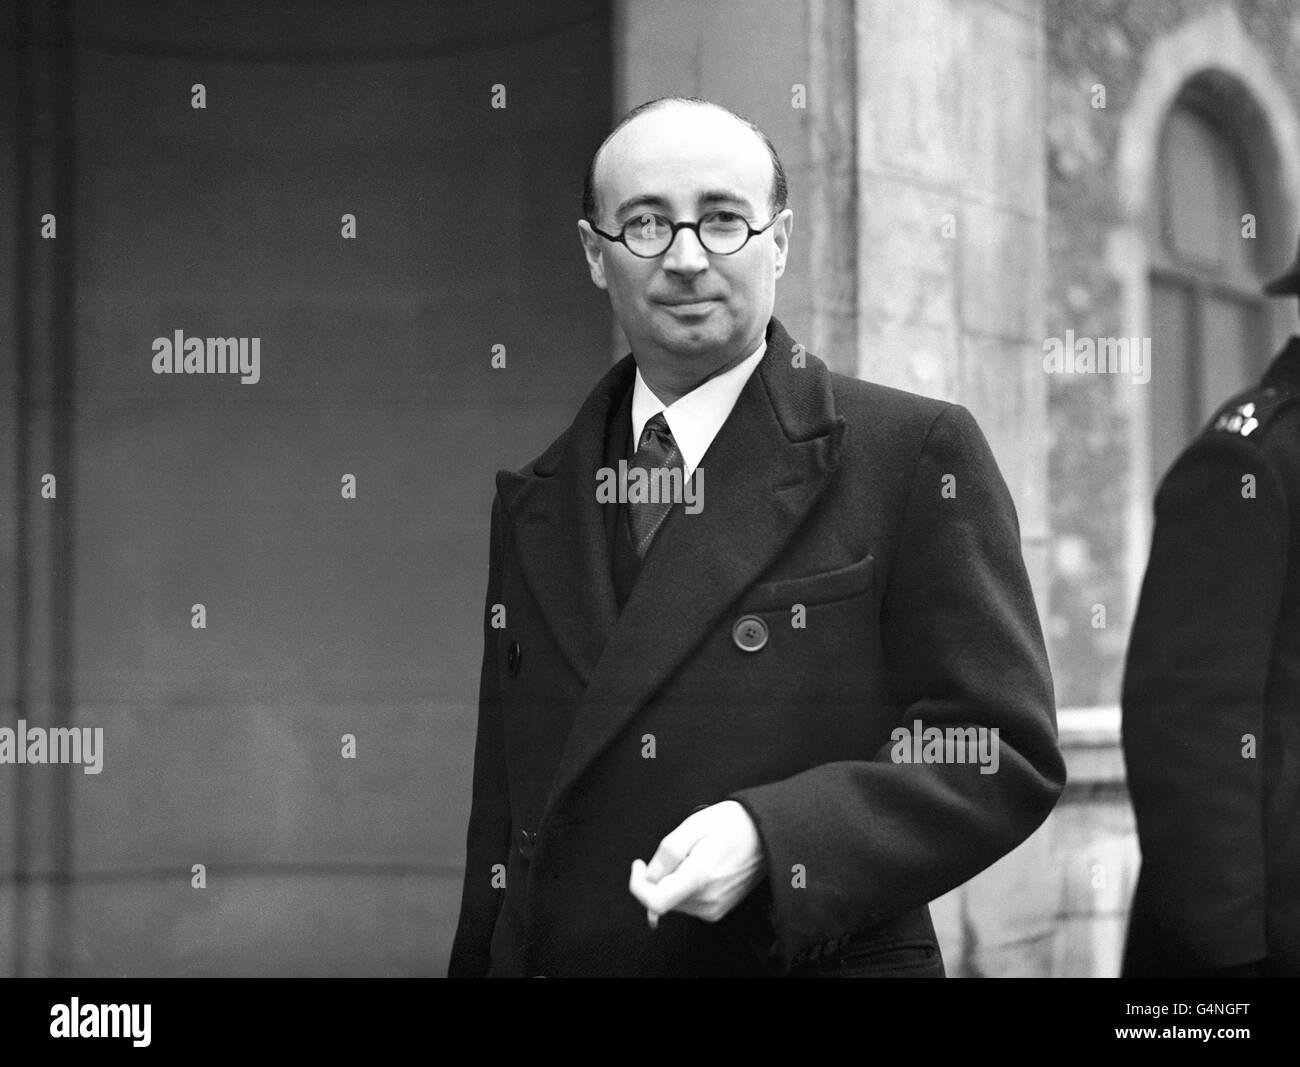 Politics - Lynskey Tribunal - Minister Bribery Allegations - London Stock Photo